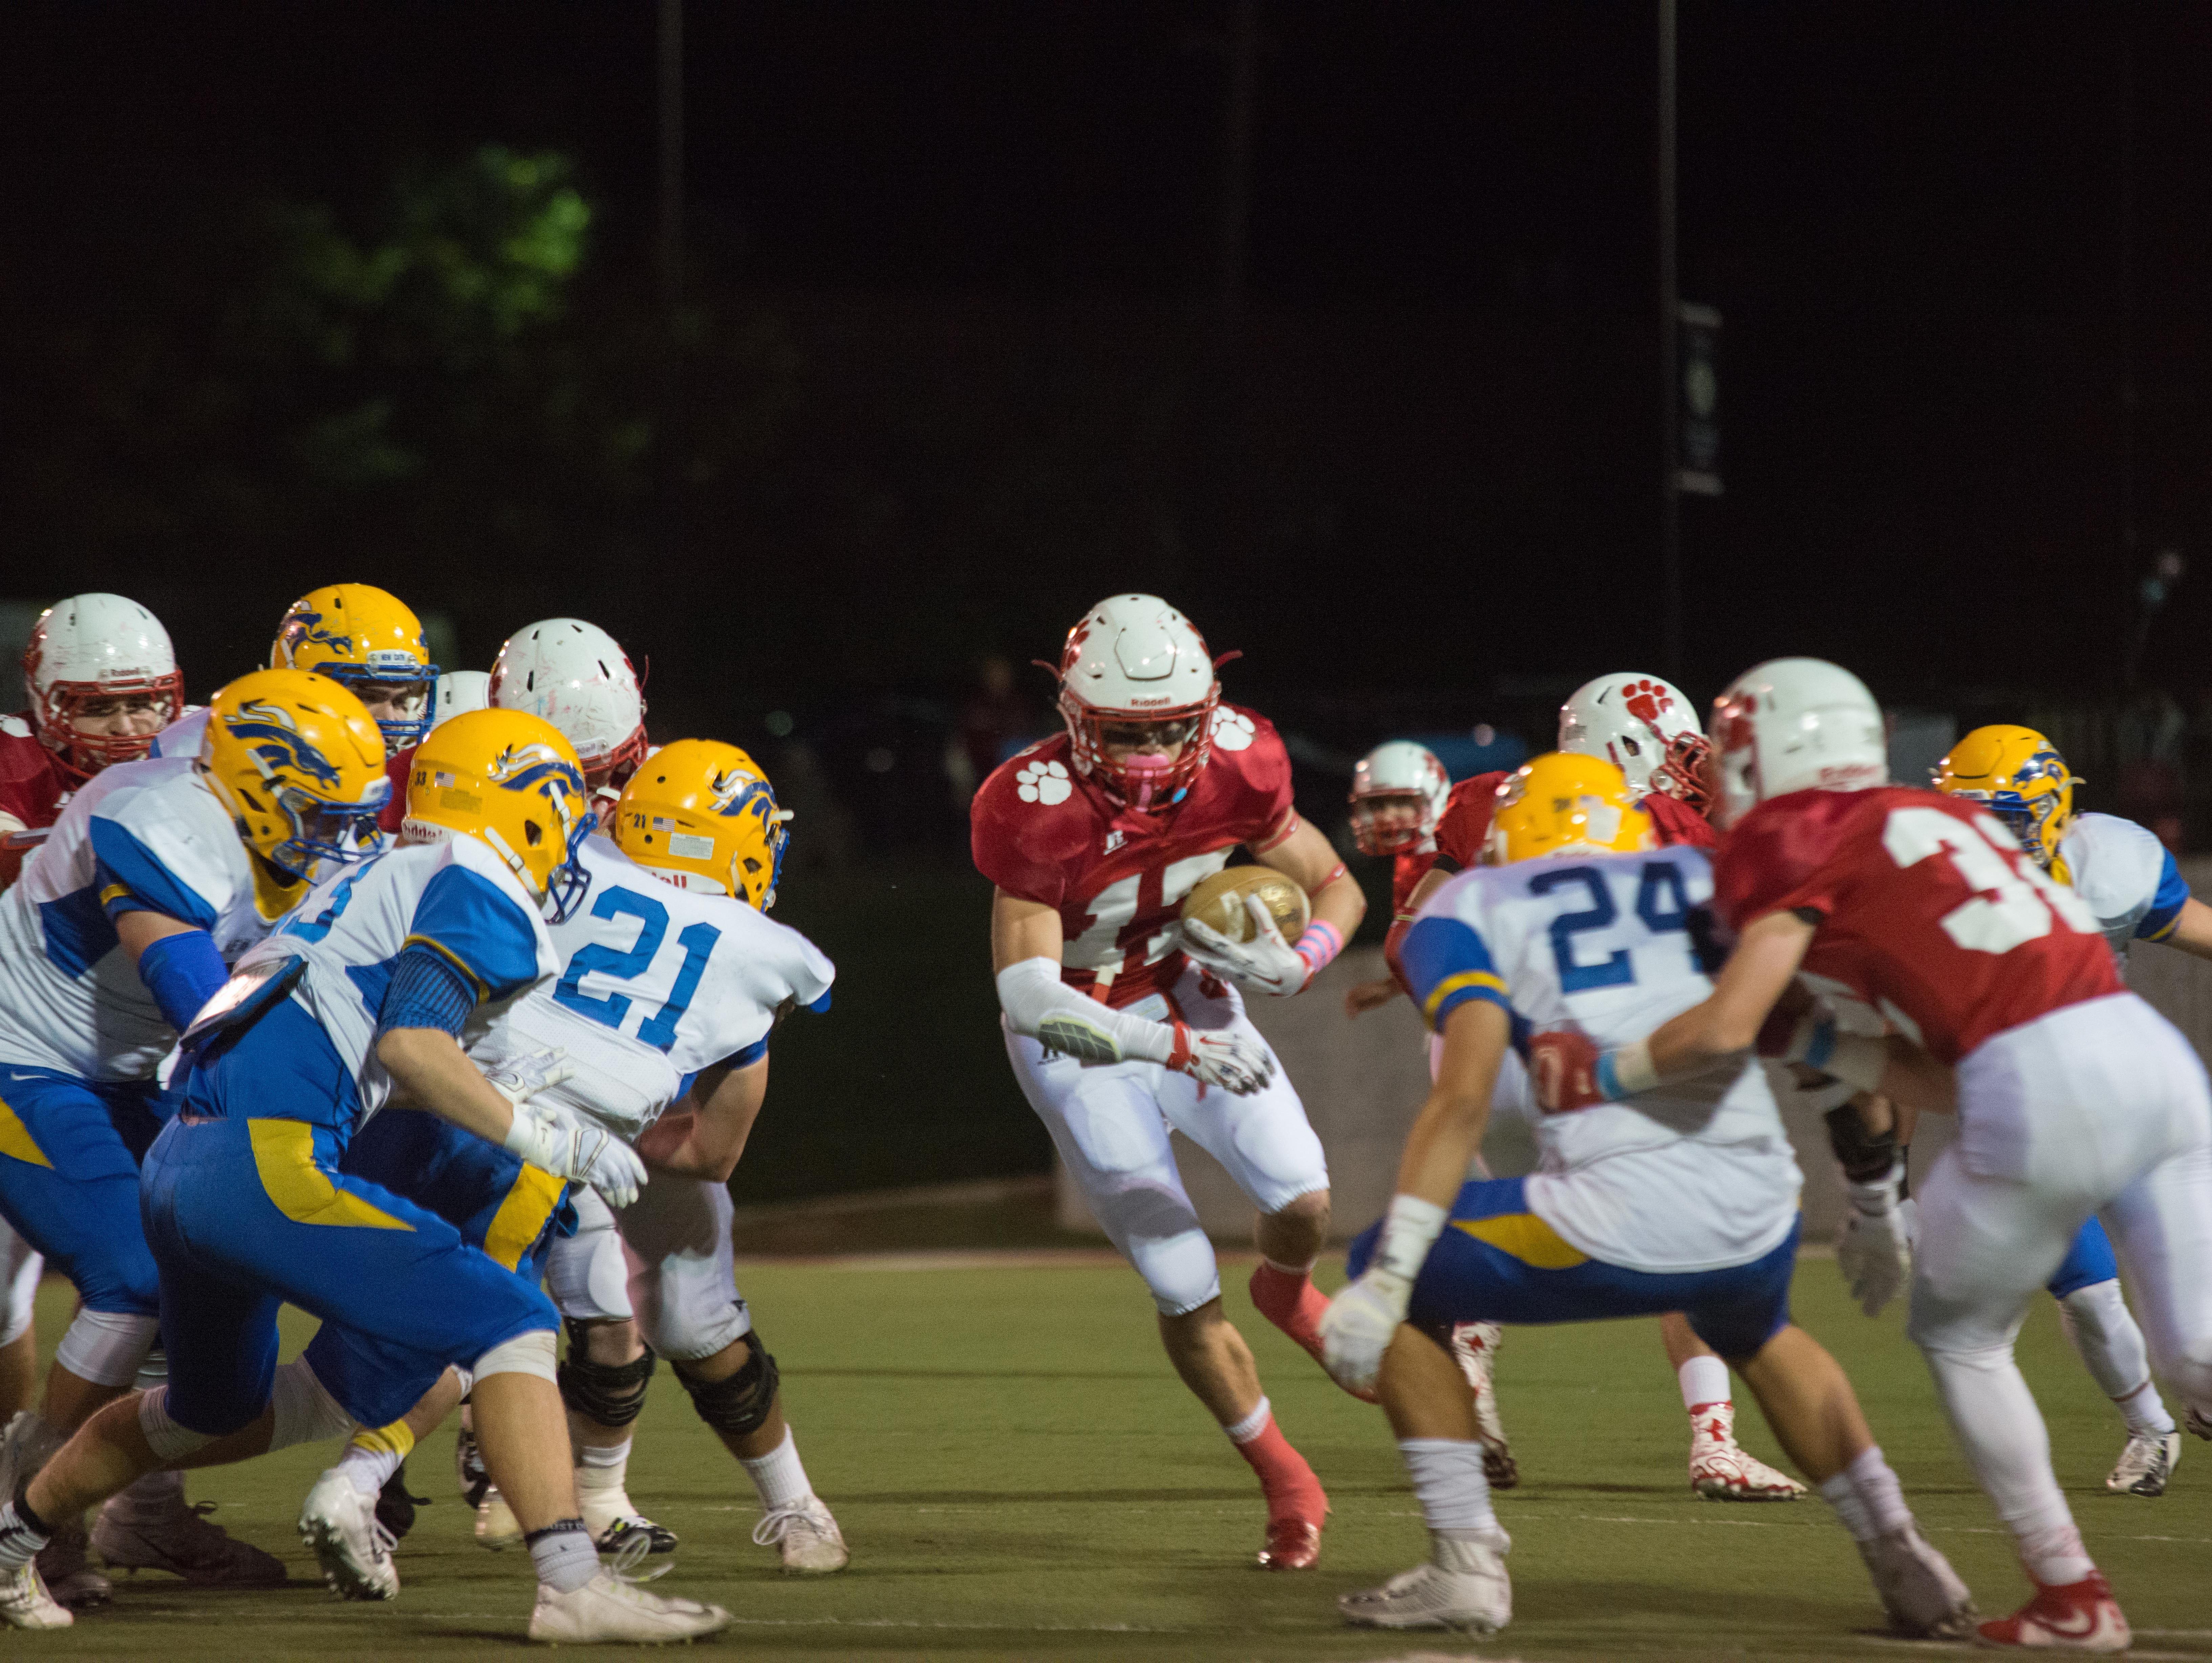 Beechwood High School plays against Newport Central Catholic on Oct. 30.